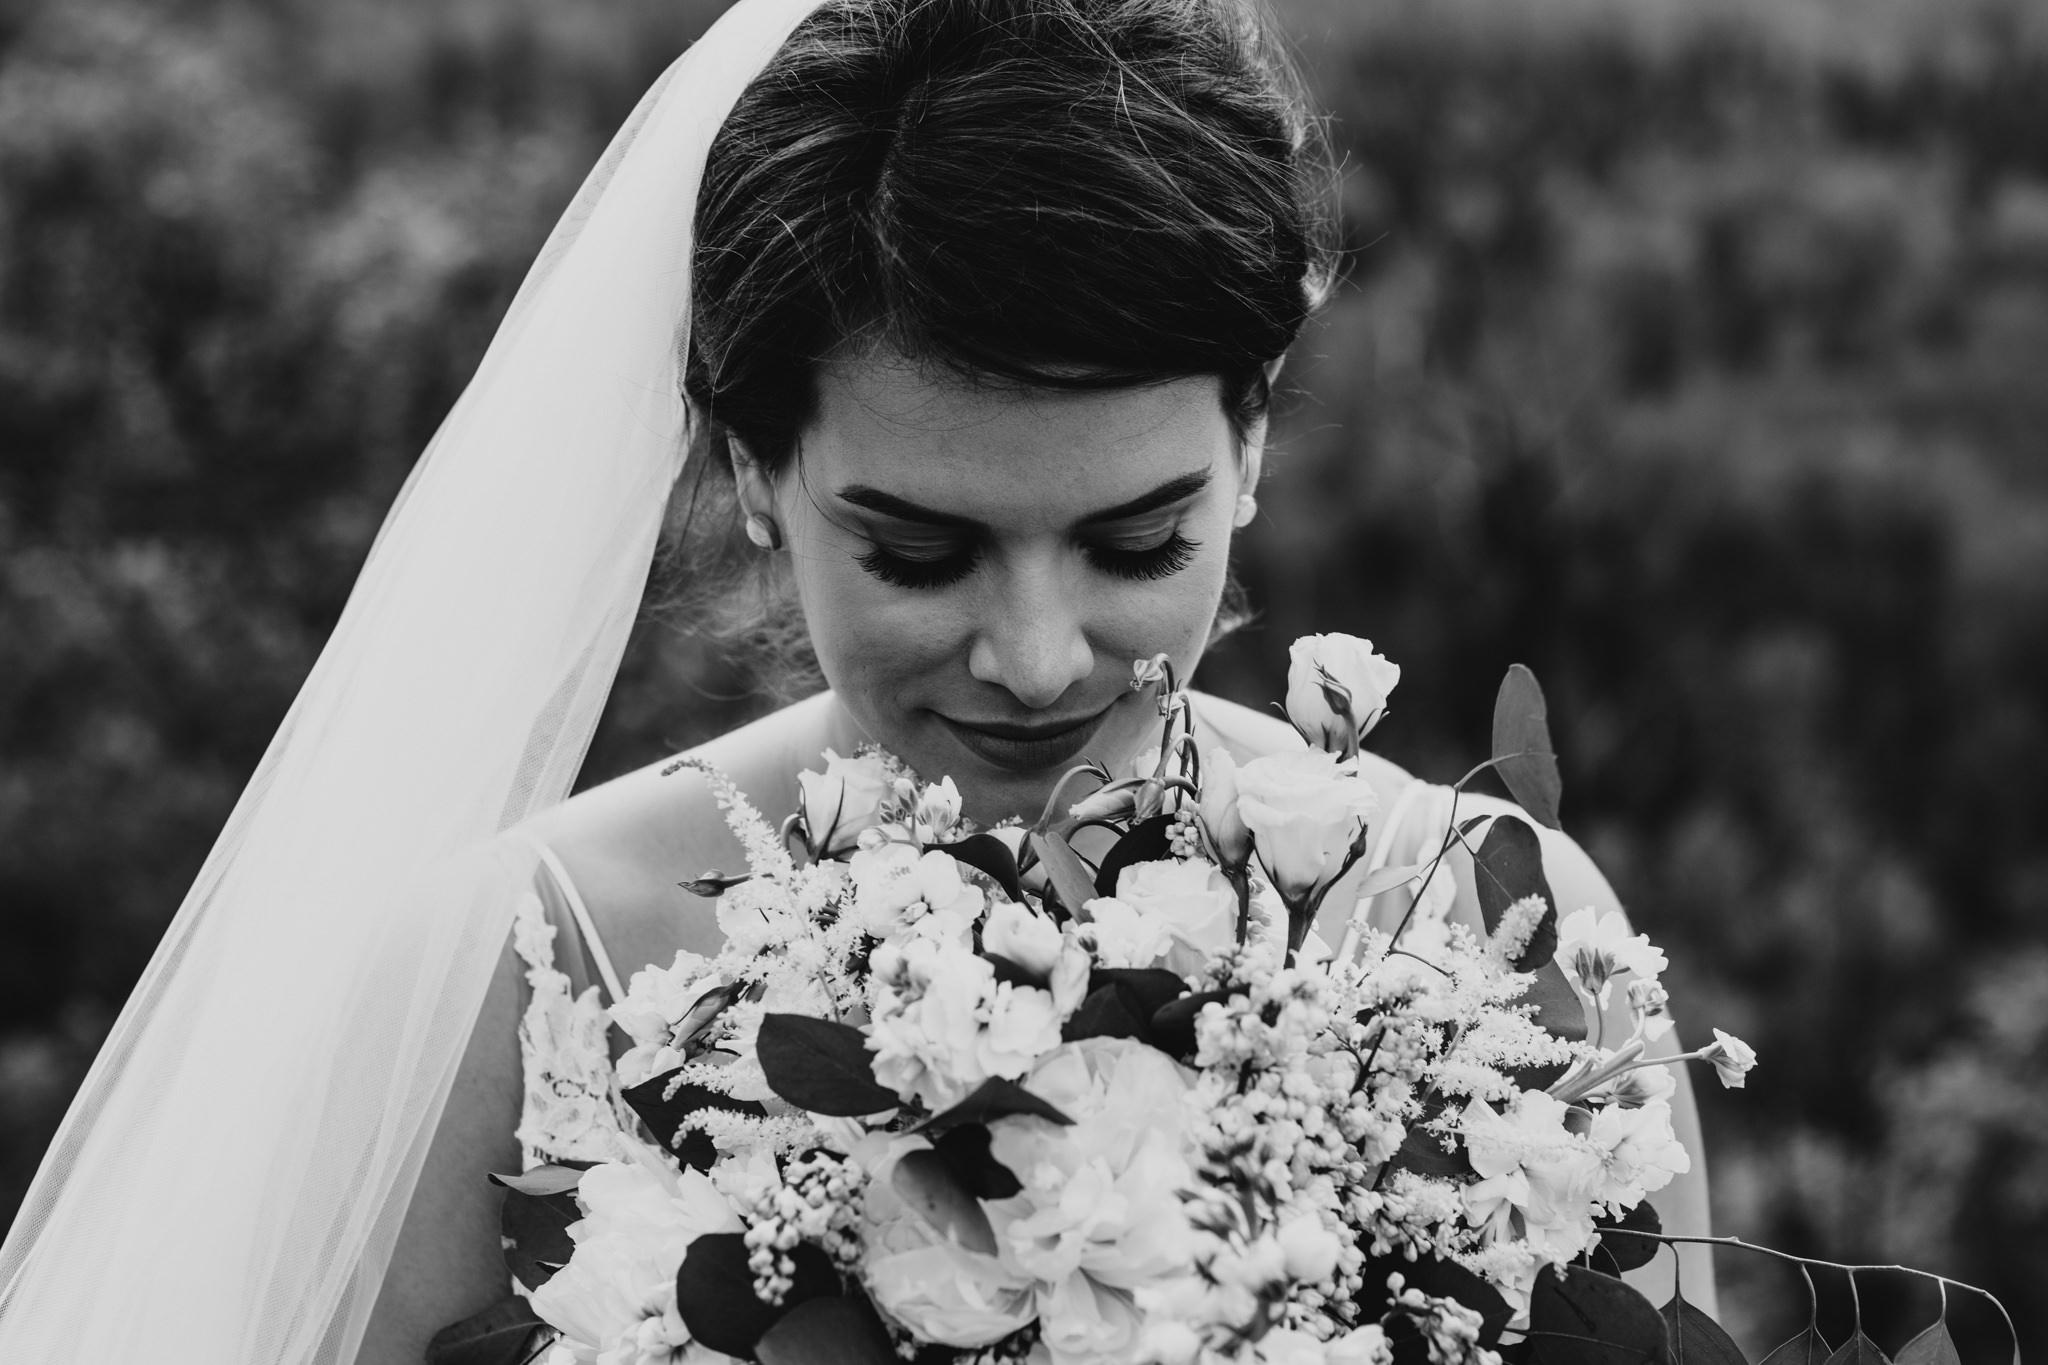 Katriina Kuhn wedding photographer